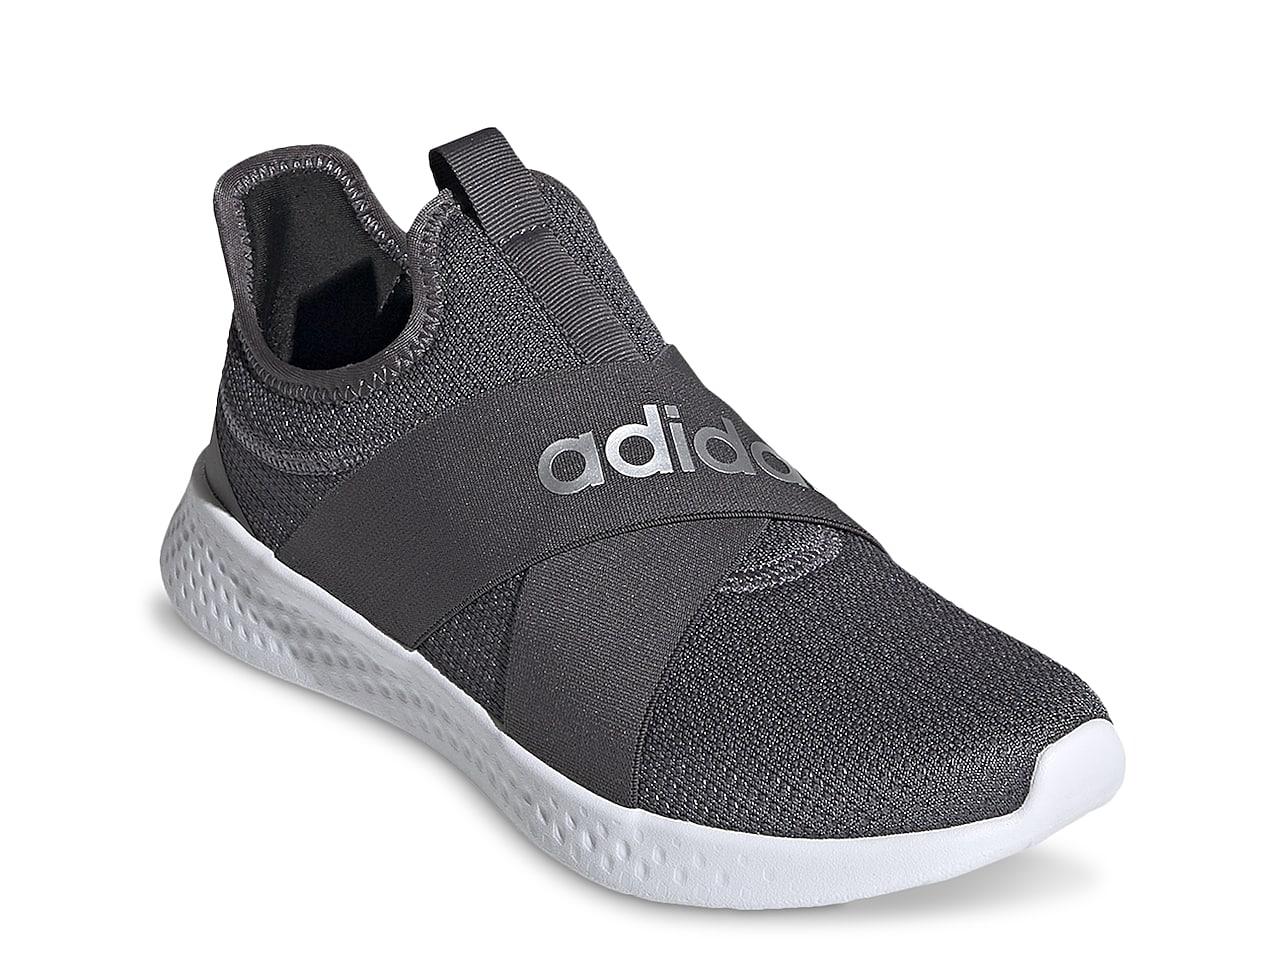 adidas Puremotion Adapt Sneaker - Women's